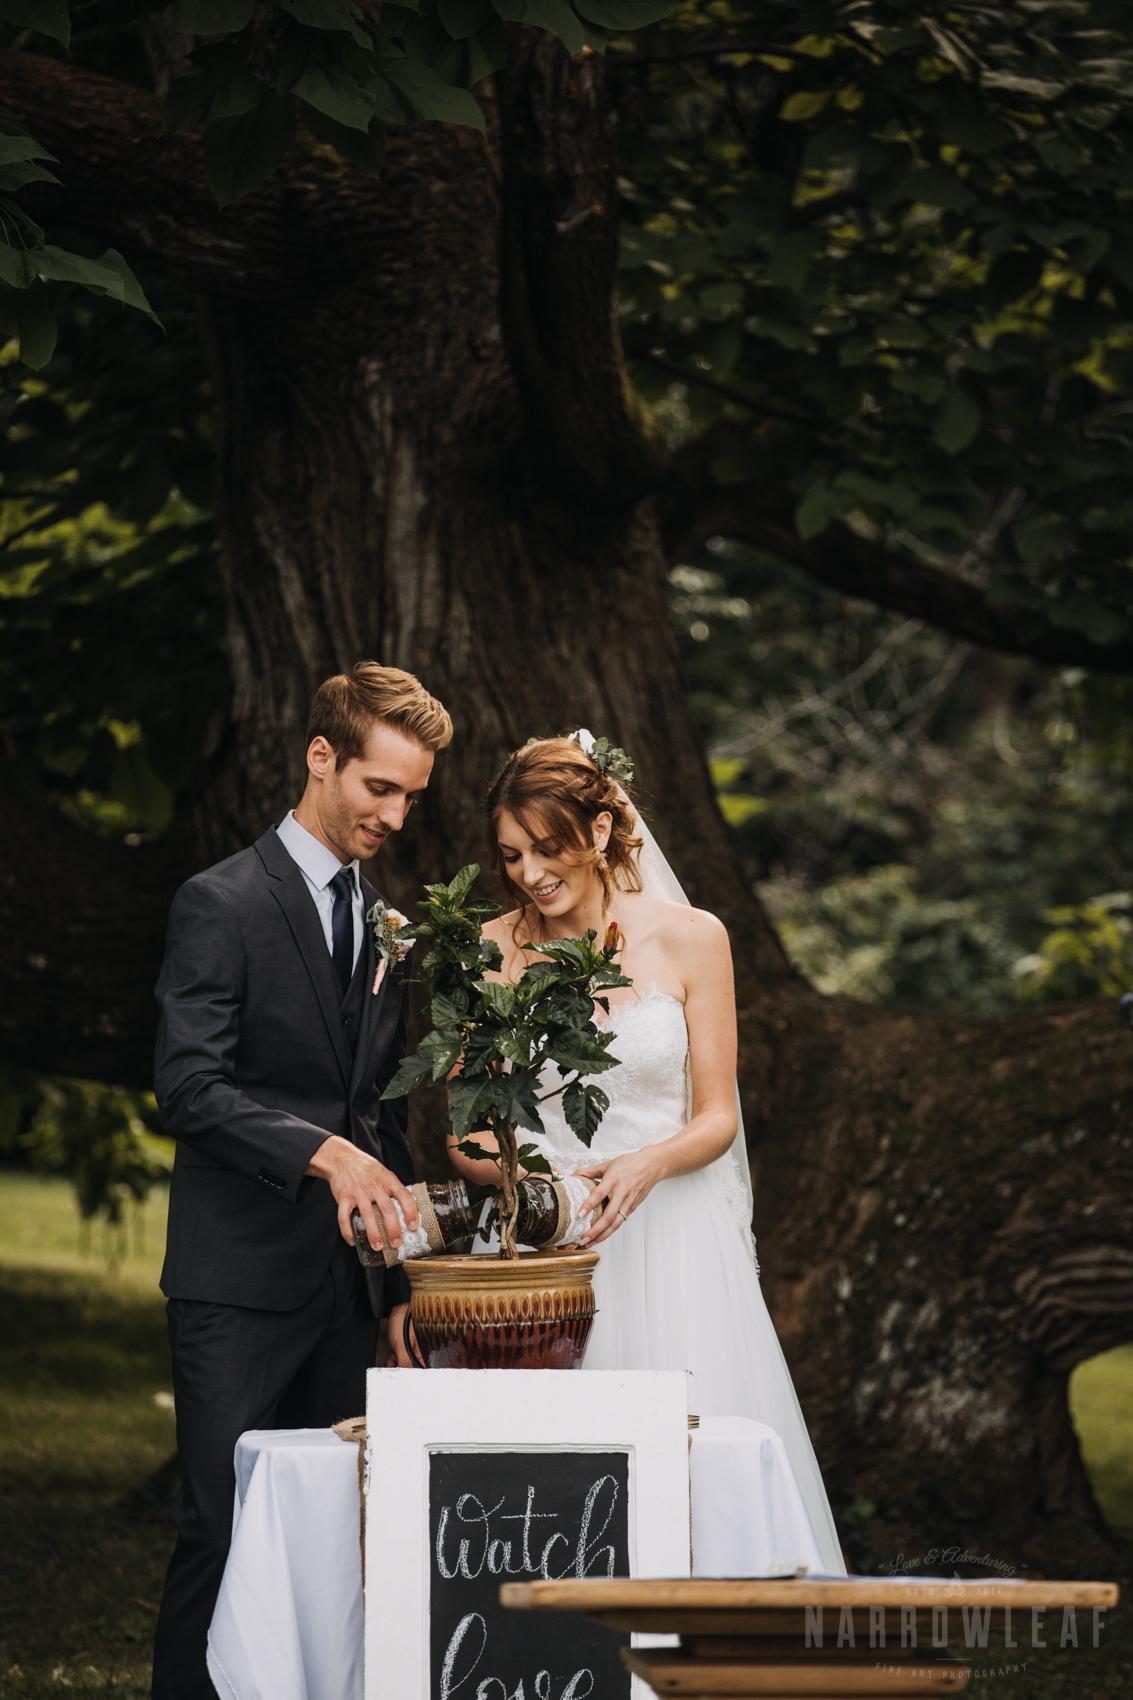 the-hilltop-wi-summer-outdoor-tree-wedding-307.jpg